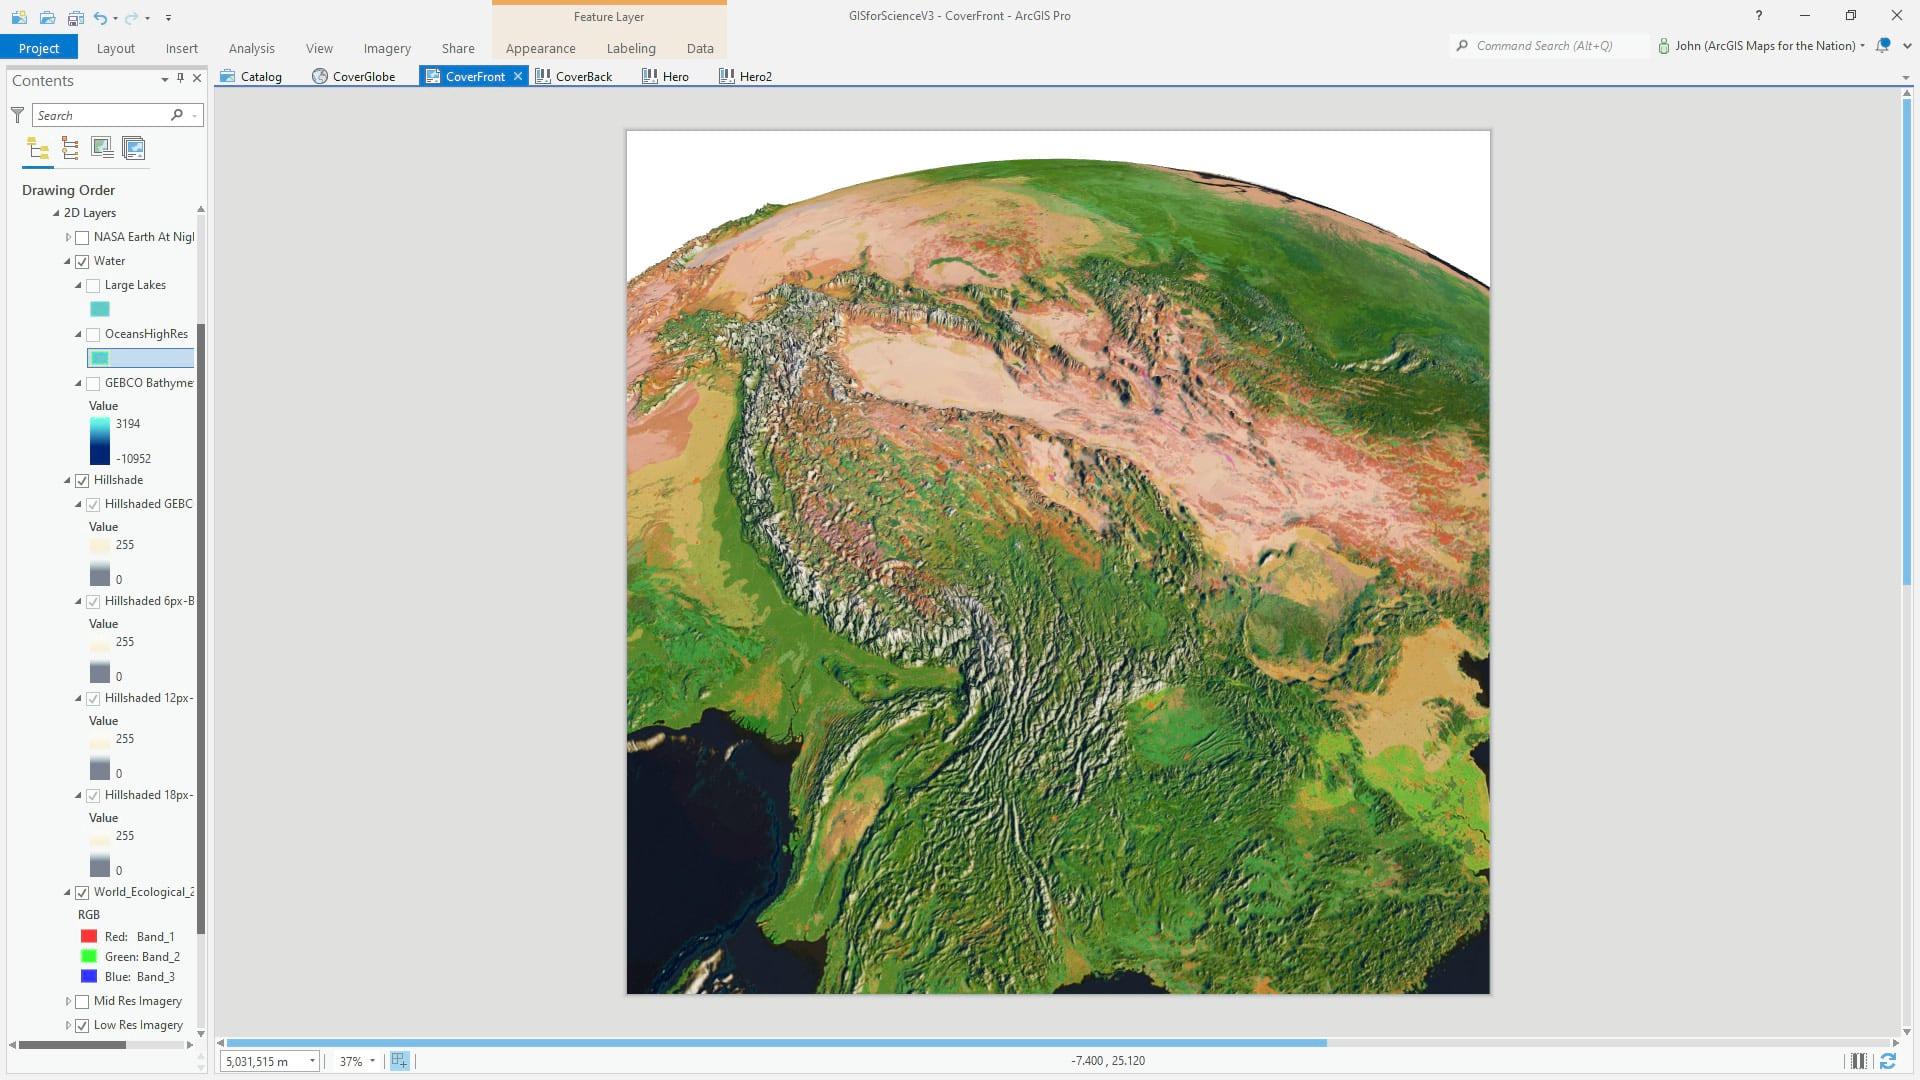 ArcGIS Pro 3D global scene with hillshade.